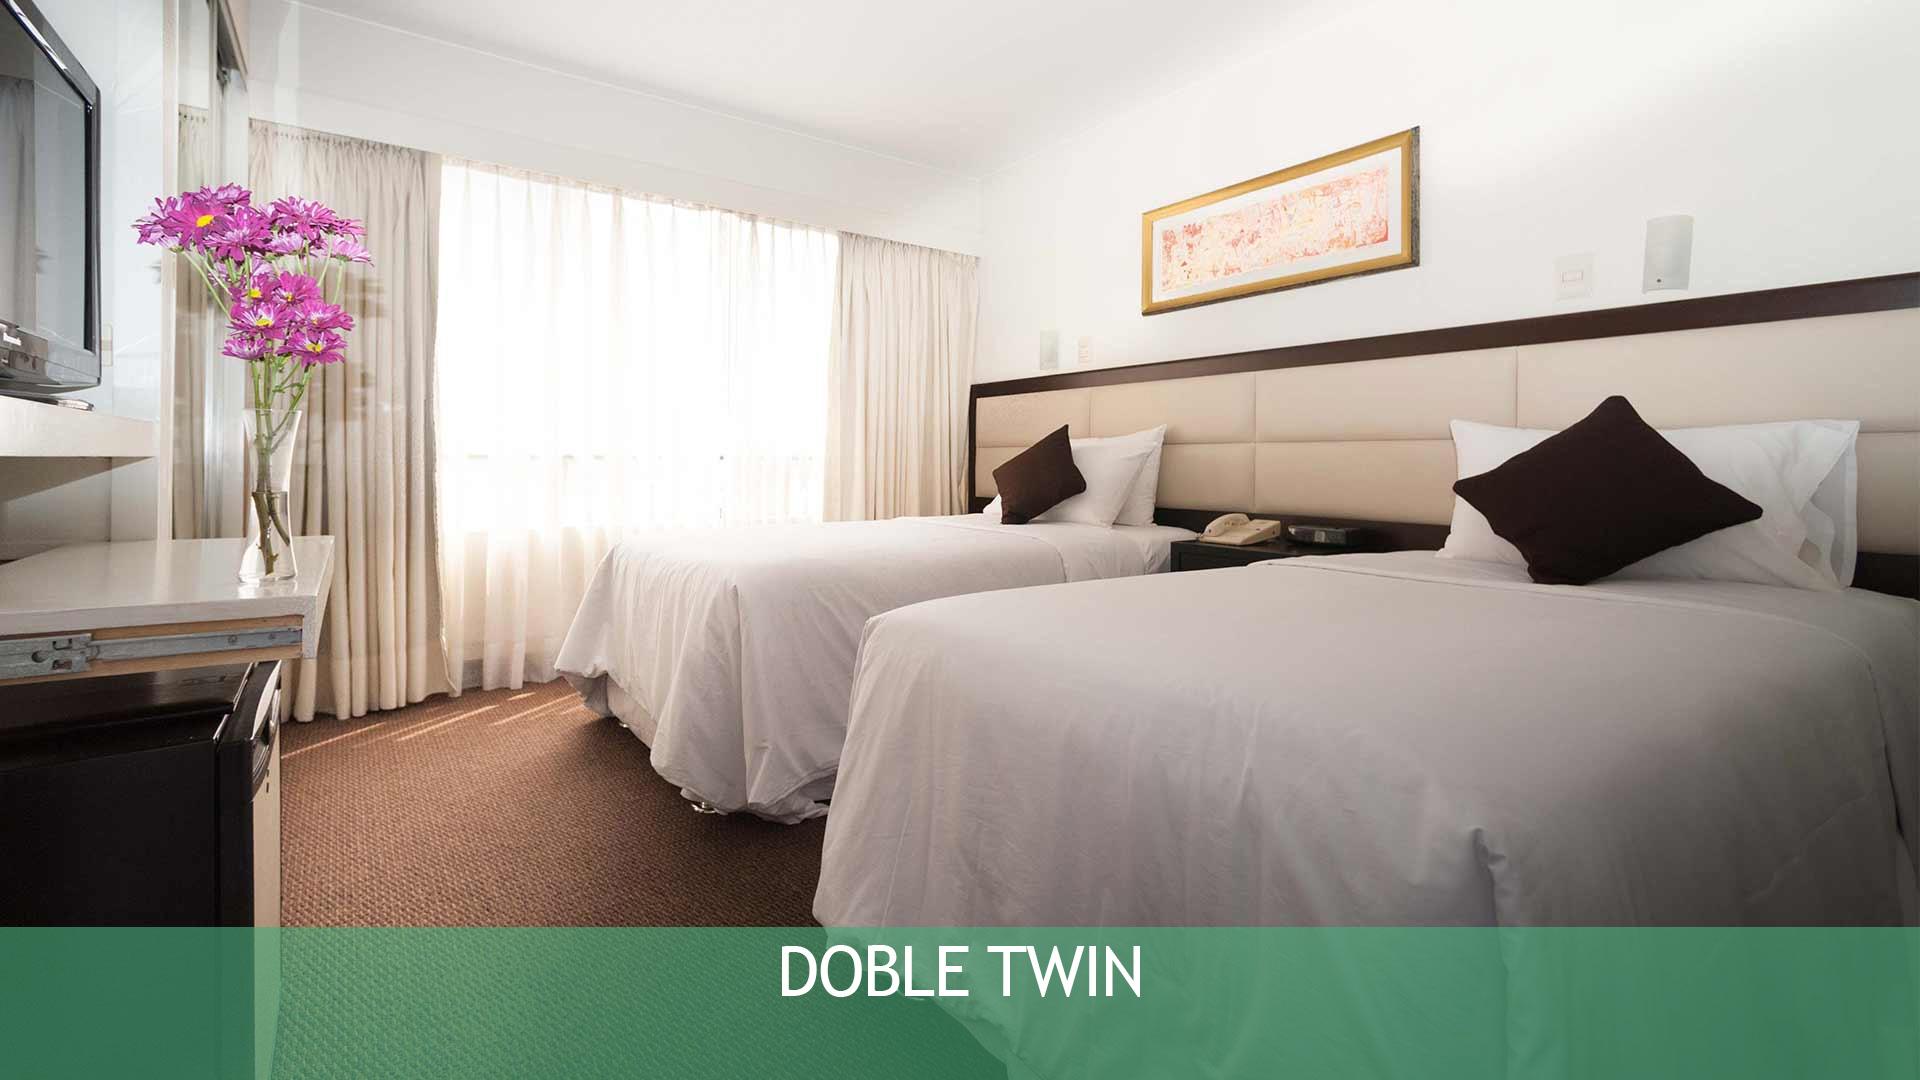 Doble Twin Hotel Roosevelt & Suites